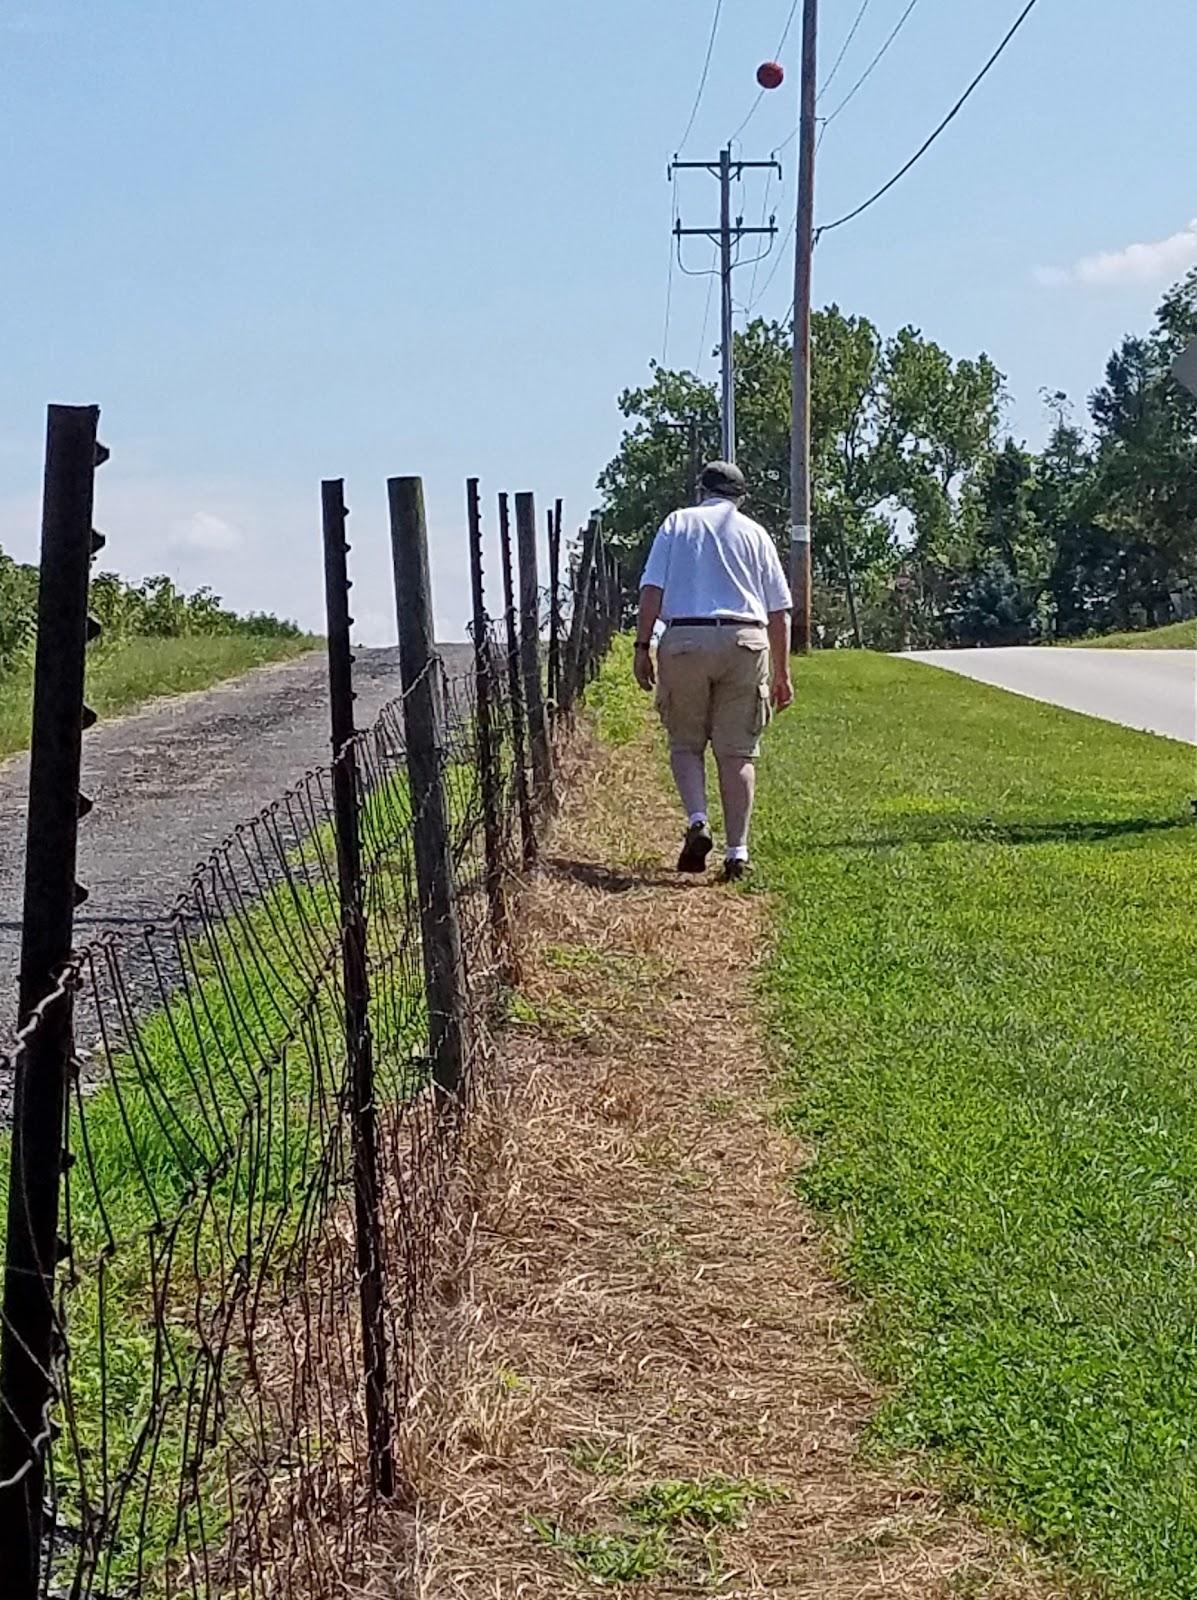 Jax Stumpes Middletown Pa Linvill Trail 9 9 10 2019